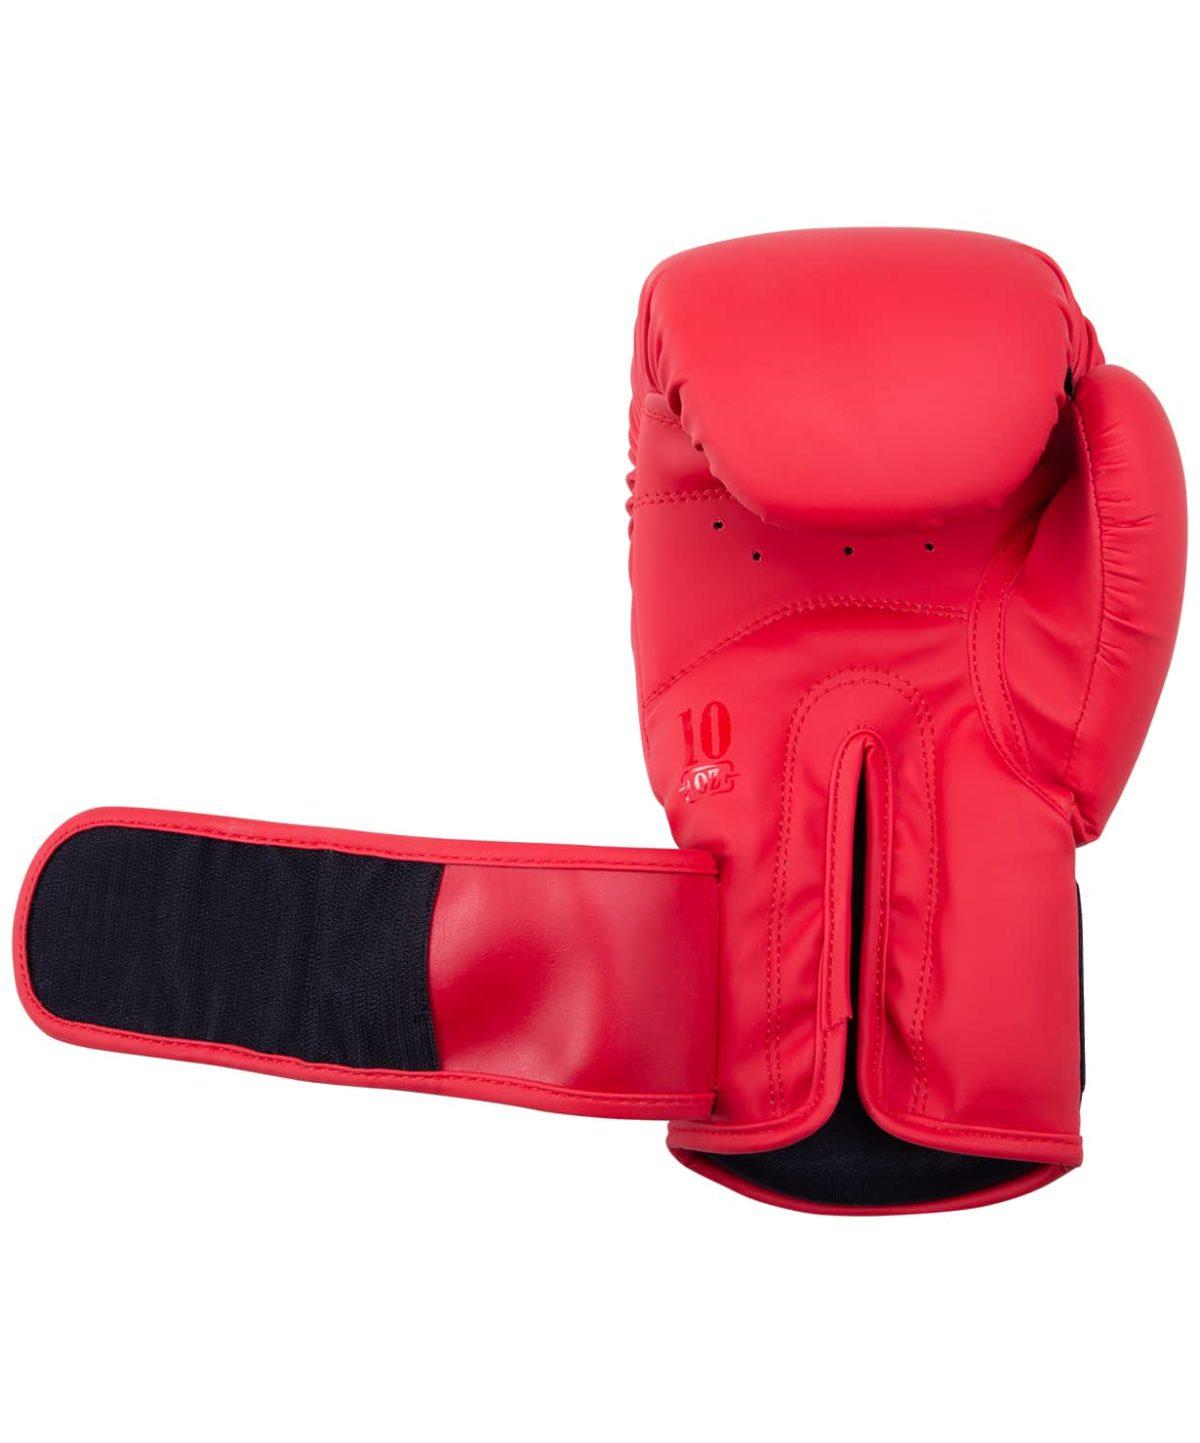 FIGHT EXPERT Перчатки боксерские 10 oz  BGS-V010: красный - 3